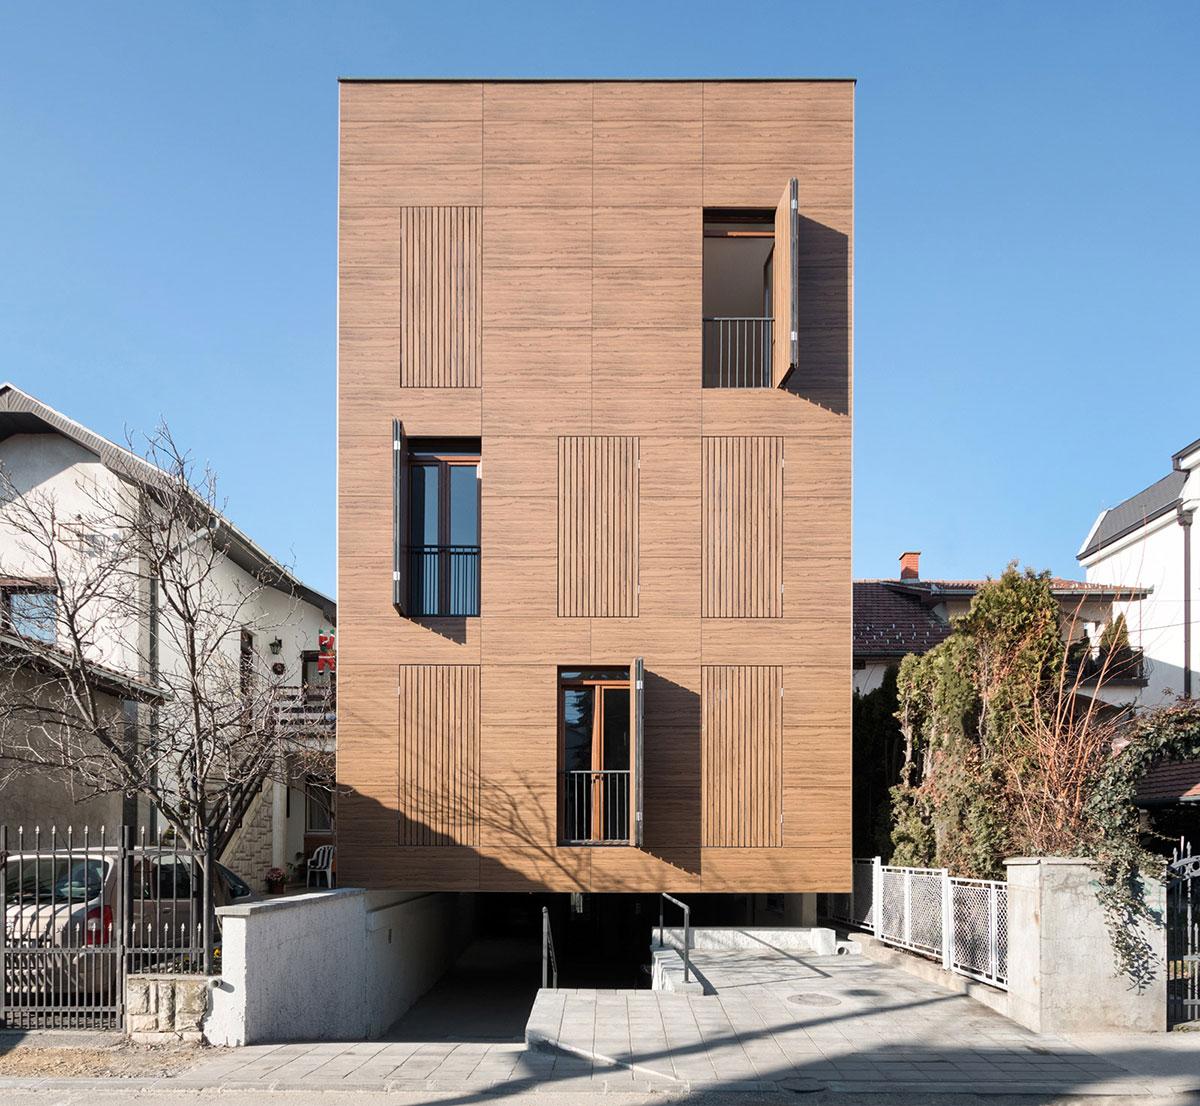 2017_Salon-arhitekture_2-1a-Nagrada-ARHITEKTURA-Simovici-N1-Housing